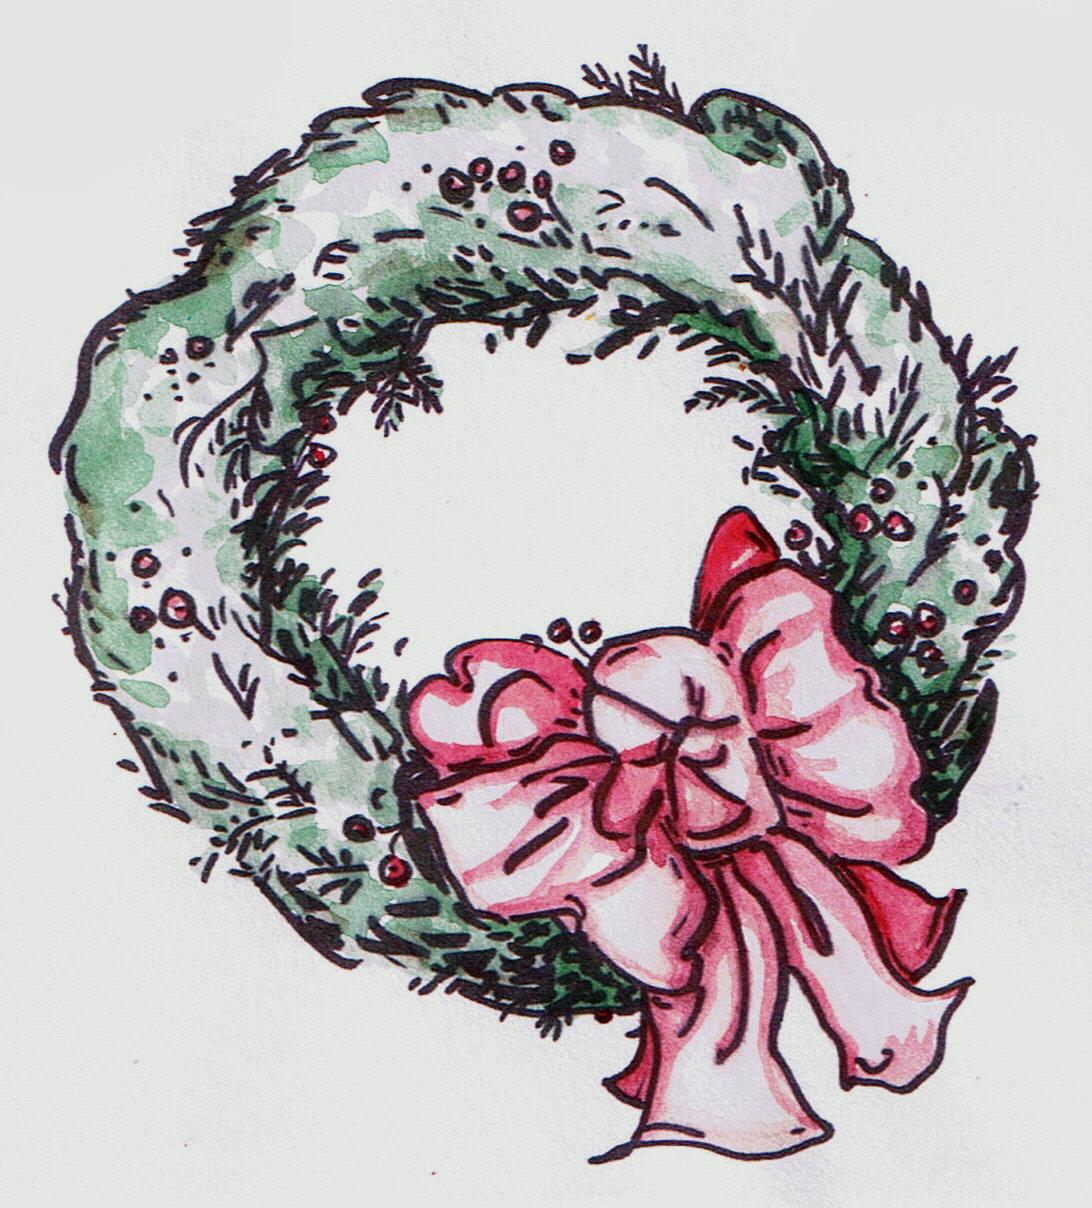 Christmas Wreath Vintage Drawing Free Image